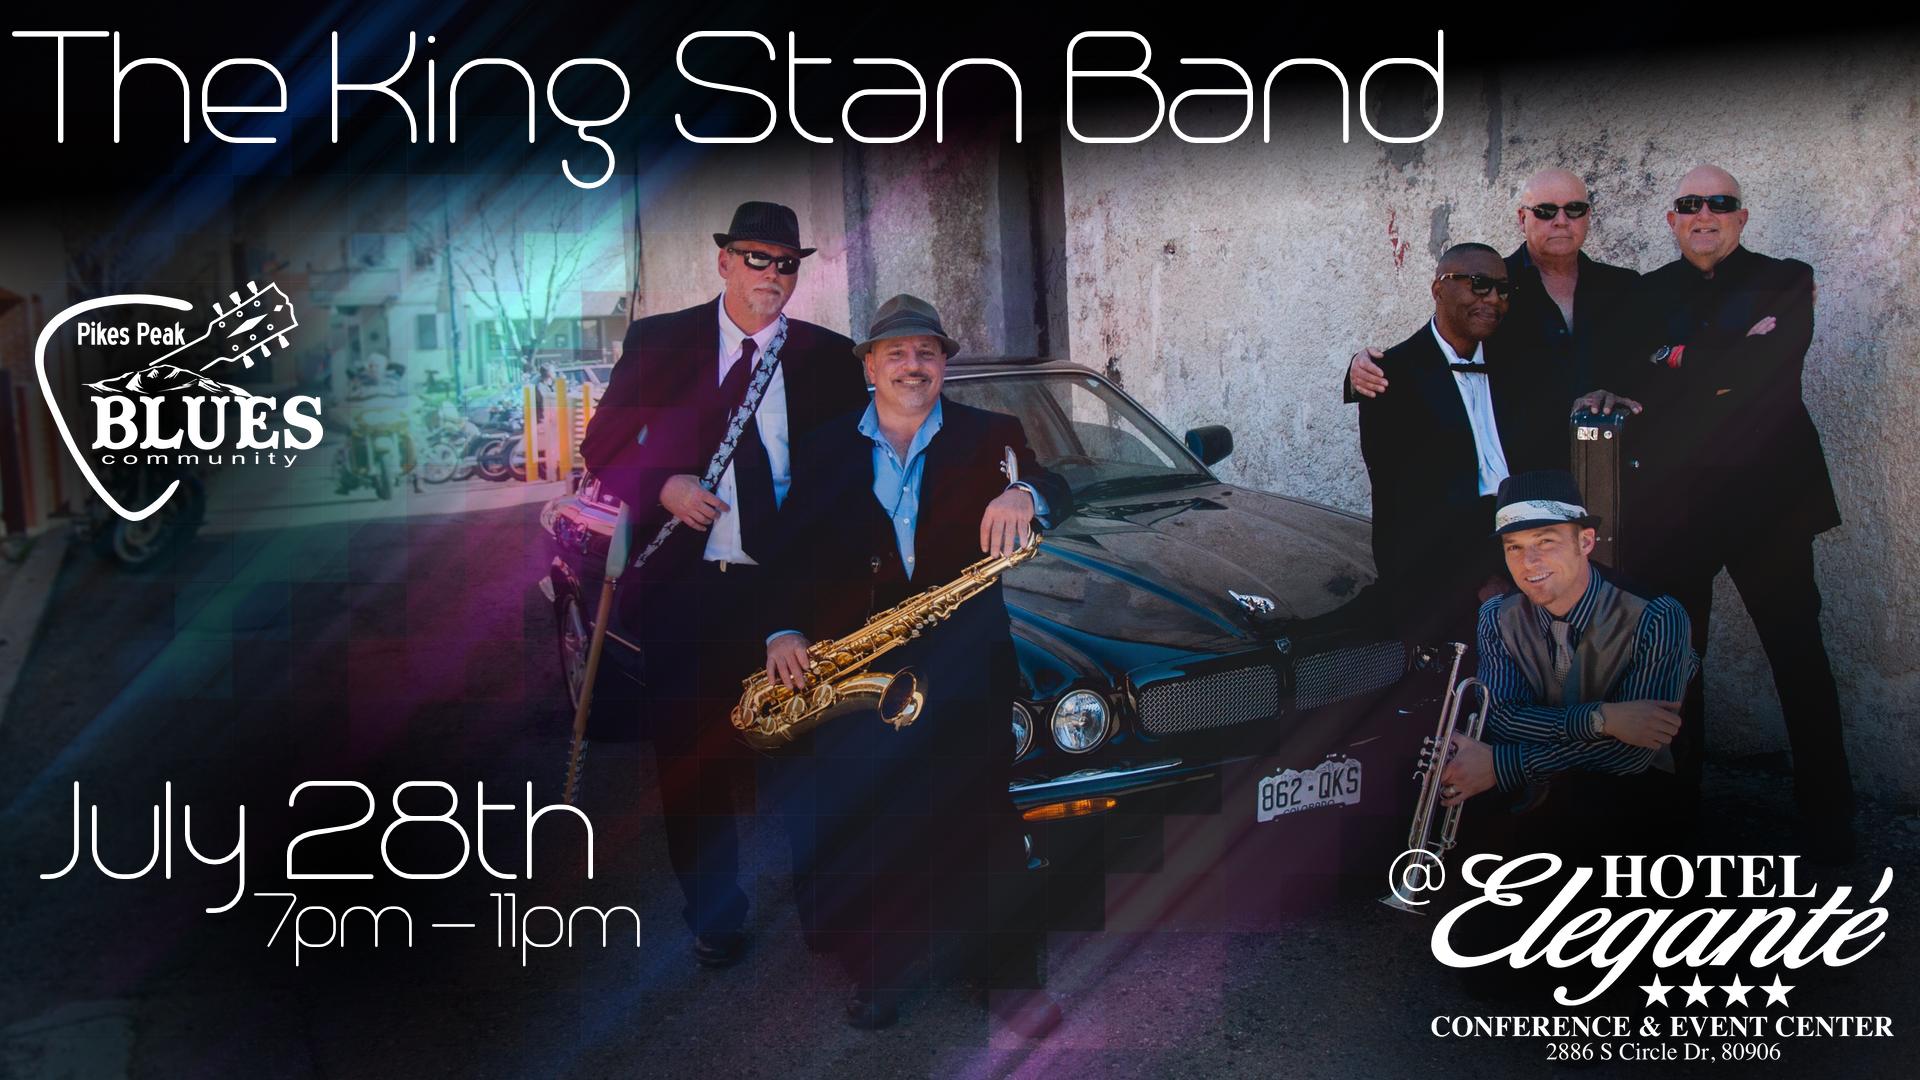 King Stan Band